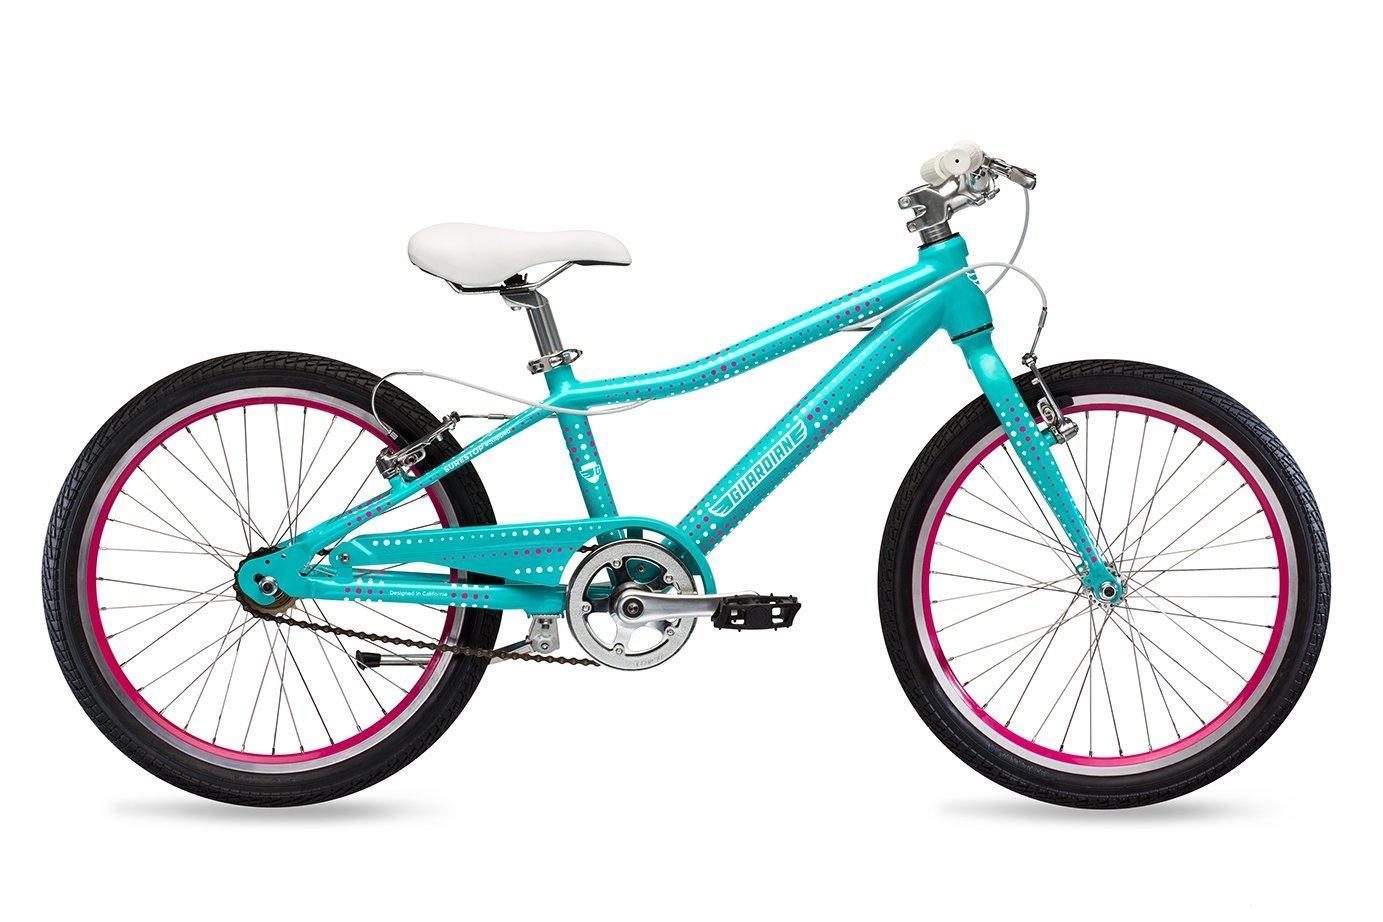 Guardian Lightweight Kids Bike 20 Inch, Safe Patented SureStop Brake System, Kids Mountain Bike, Bike Sizes for Kids 3' 9'' - 4' 5'', Boys Bikes and Girls Bikes